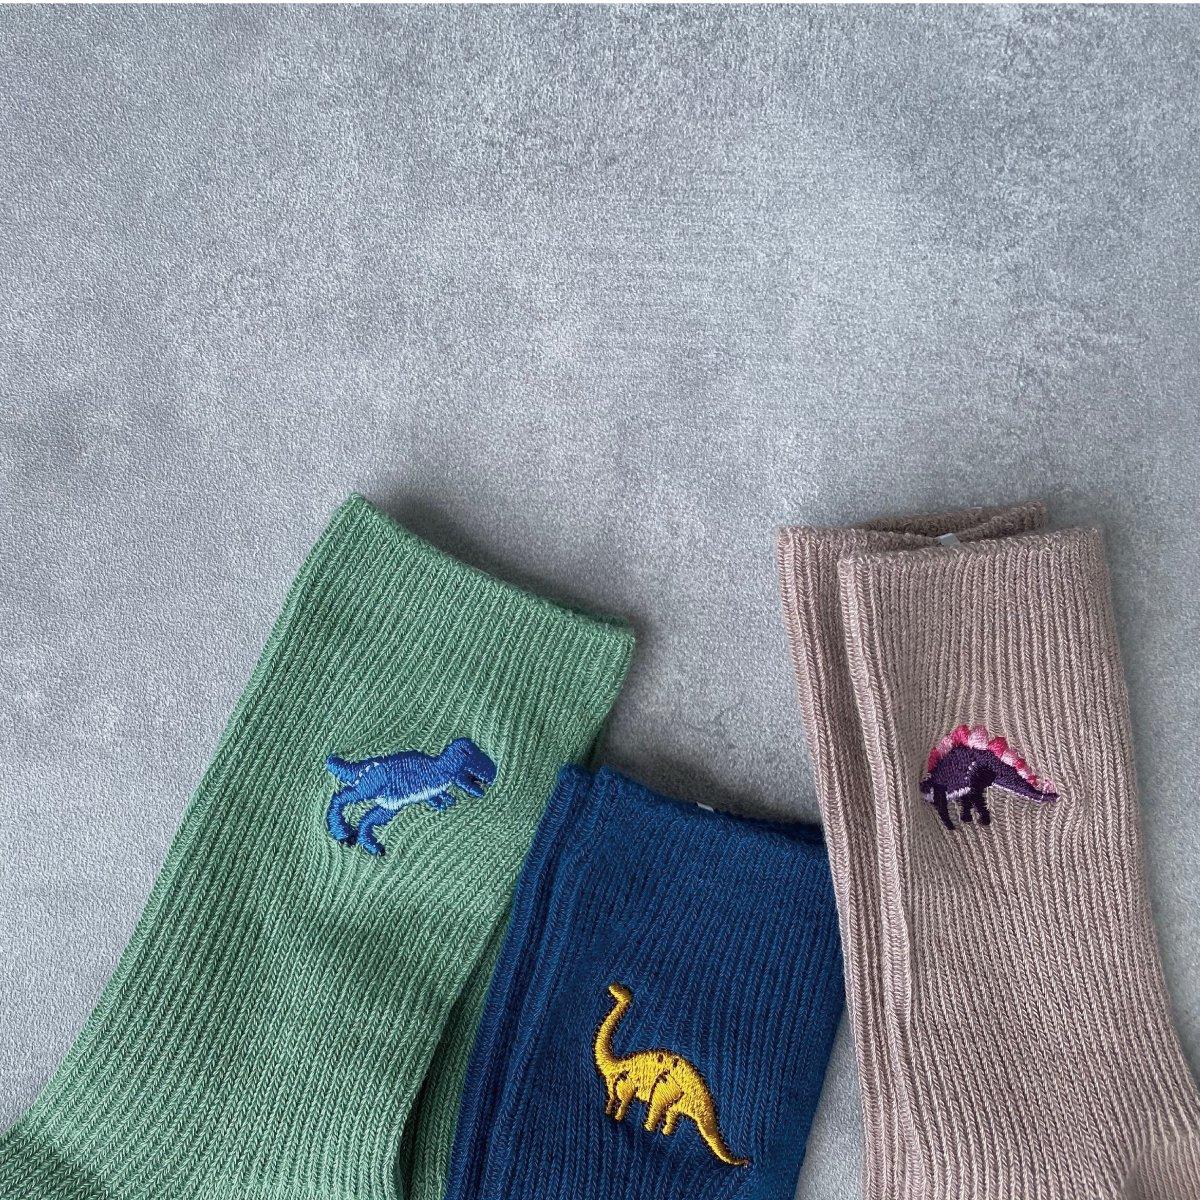 【BABY】Dino Socks 詳細画像16